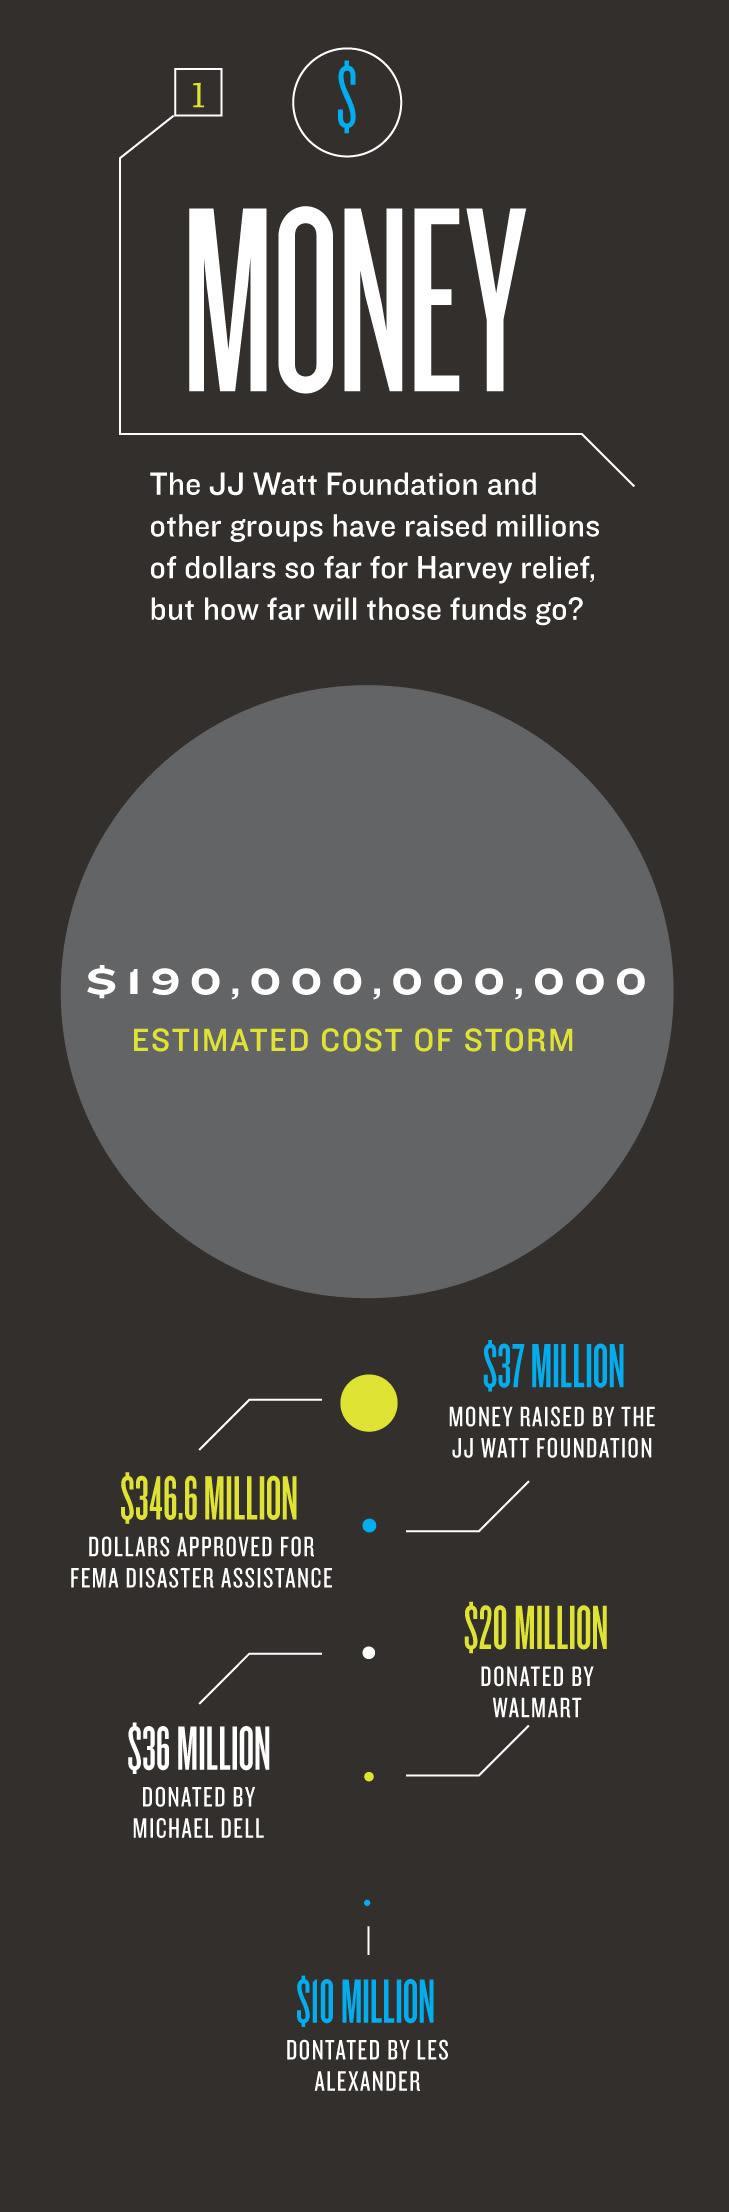 Harvey numbers money f9vhxg